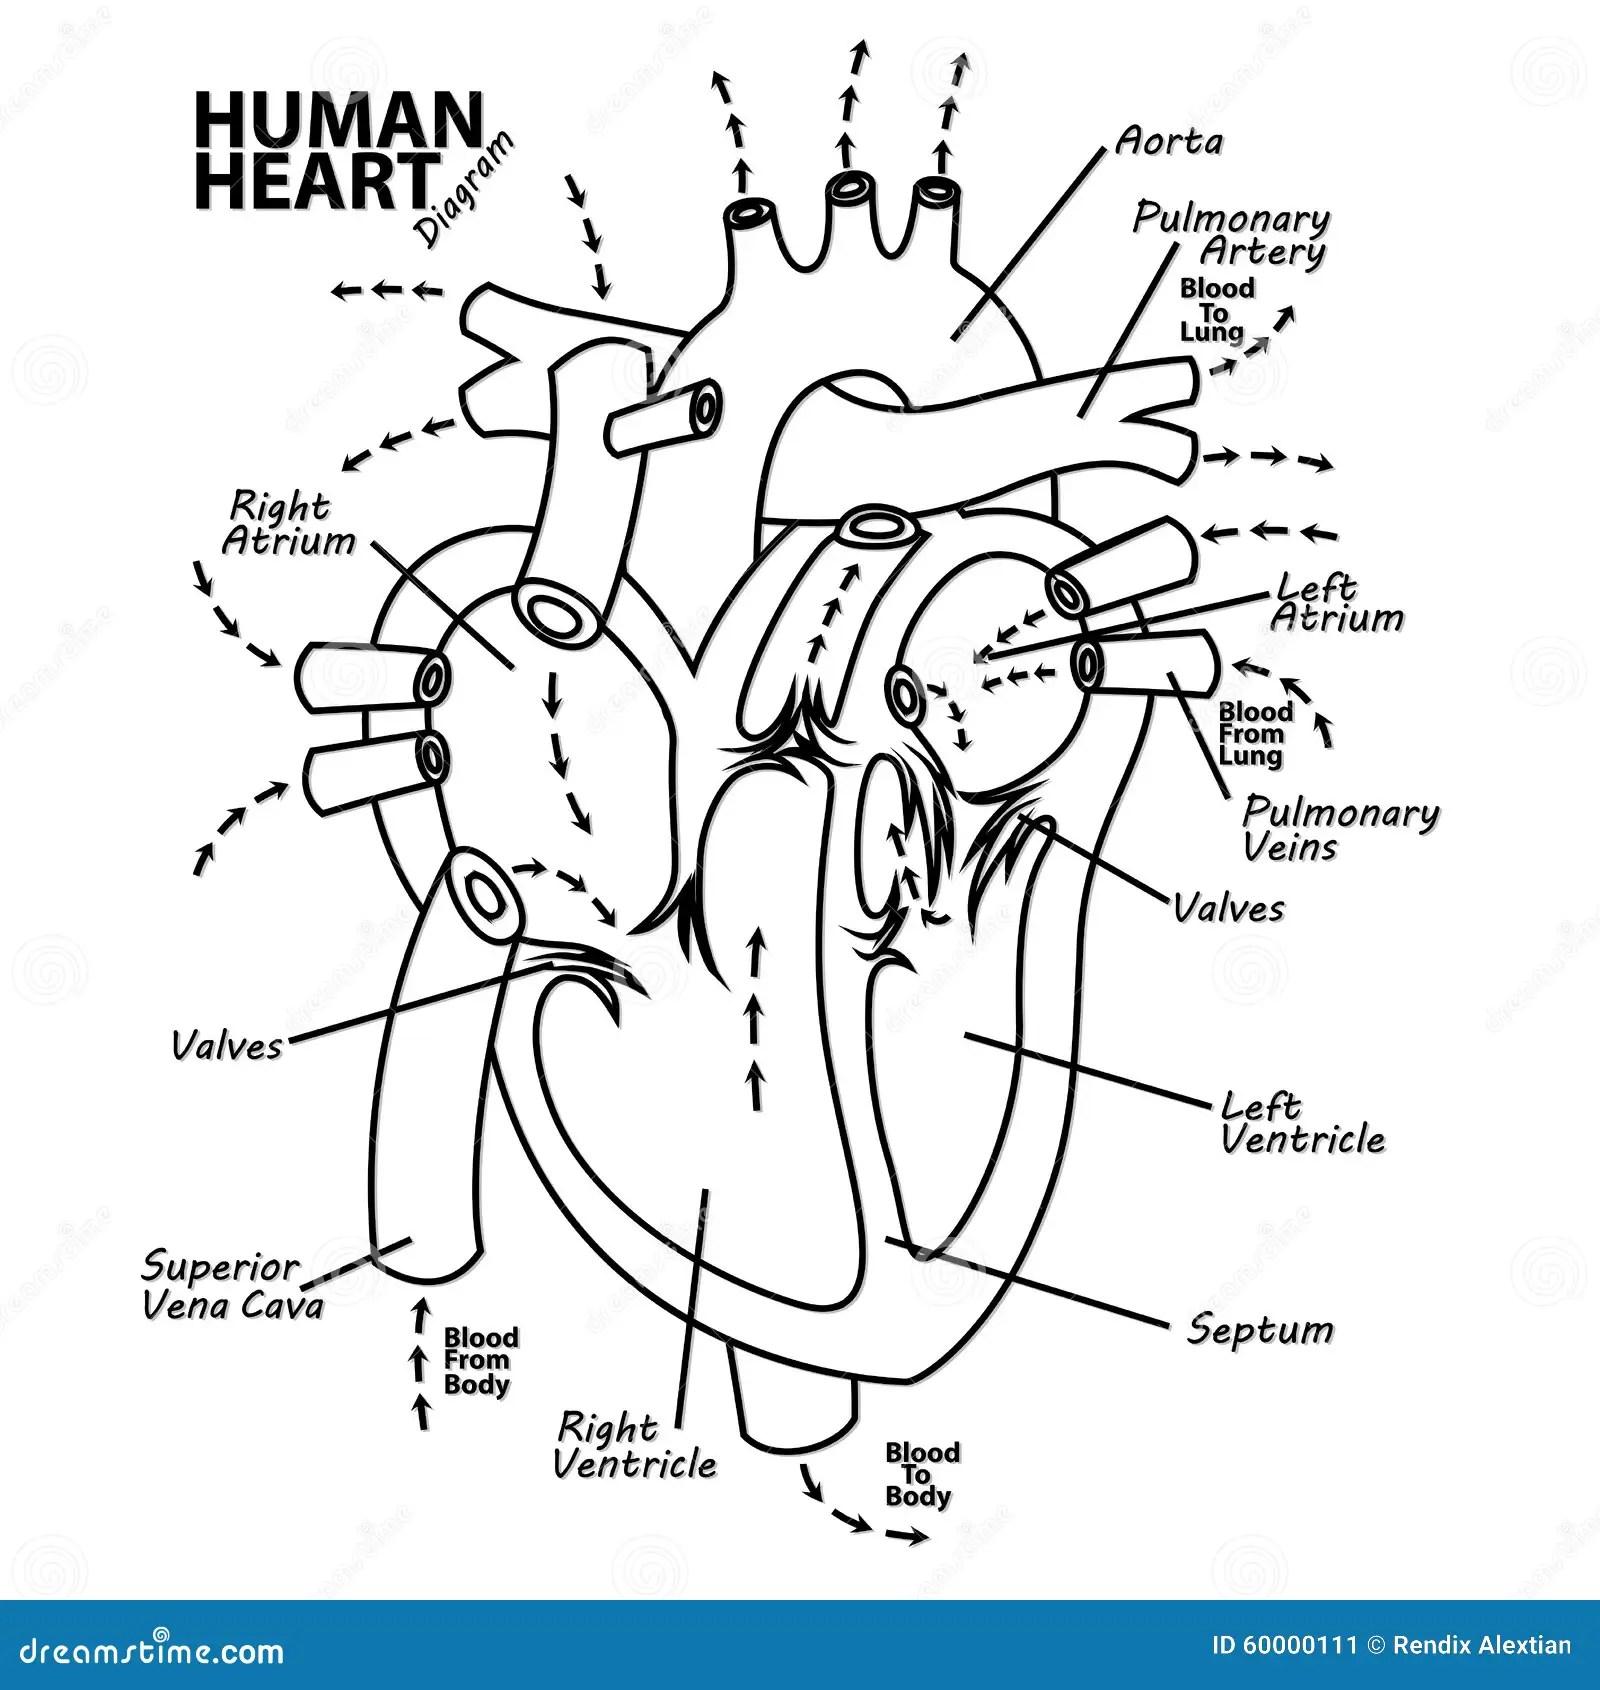 Human Heart Diagram Anatomy Tattoo Stock Vector